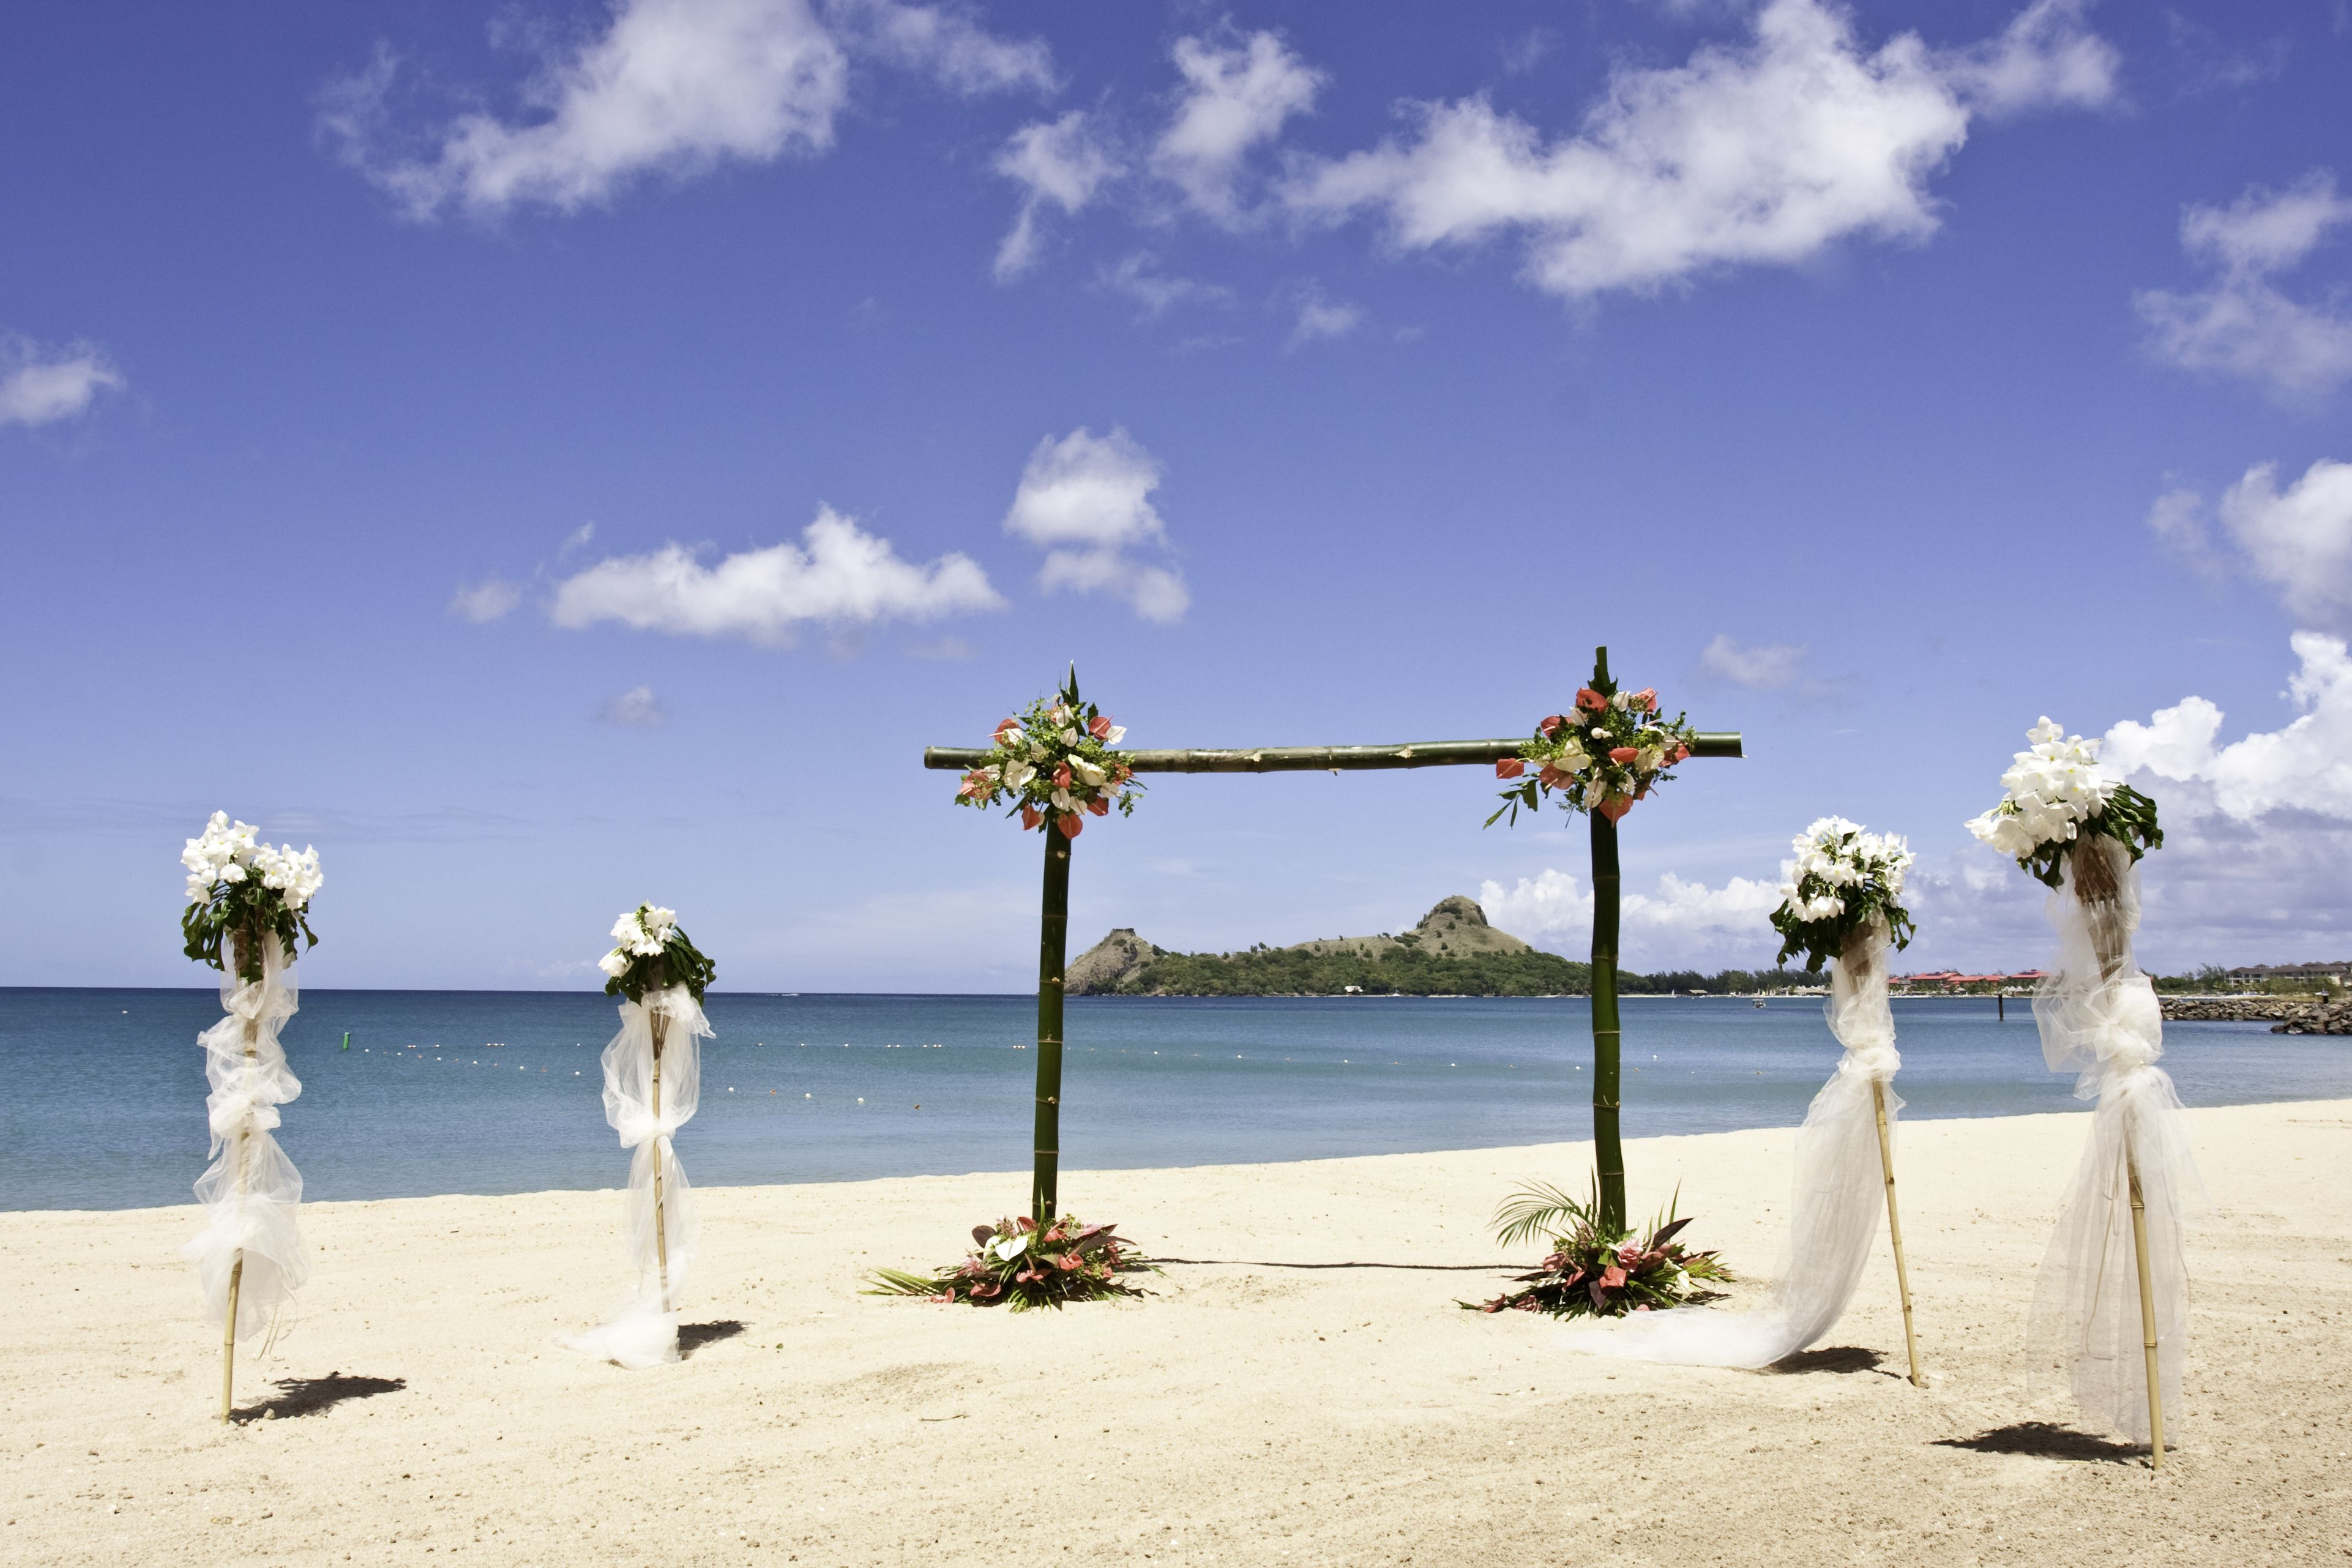 Beach Wedding Set Up At The Bay Gardens Beach Resort U0026 Spa In Saint Lucia